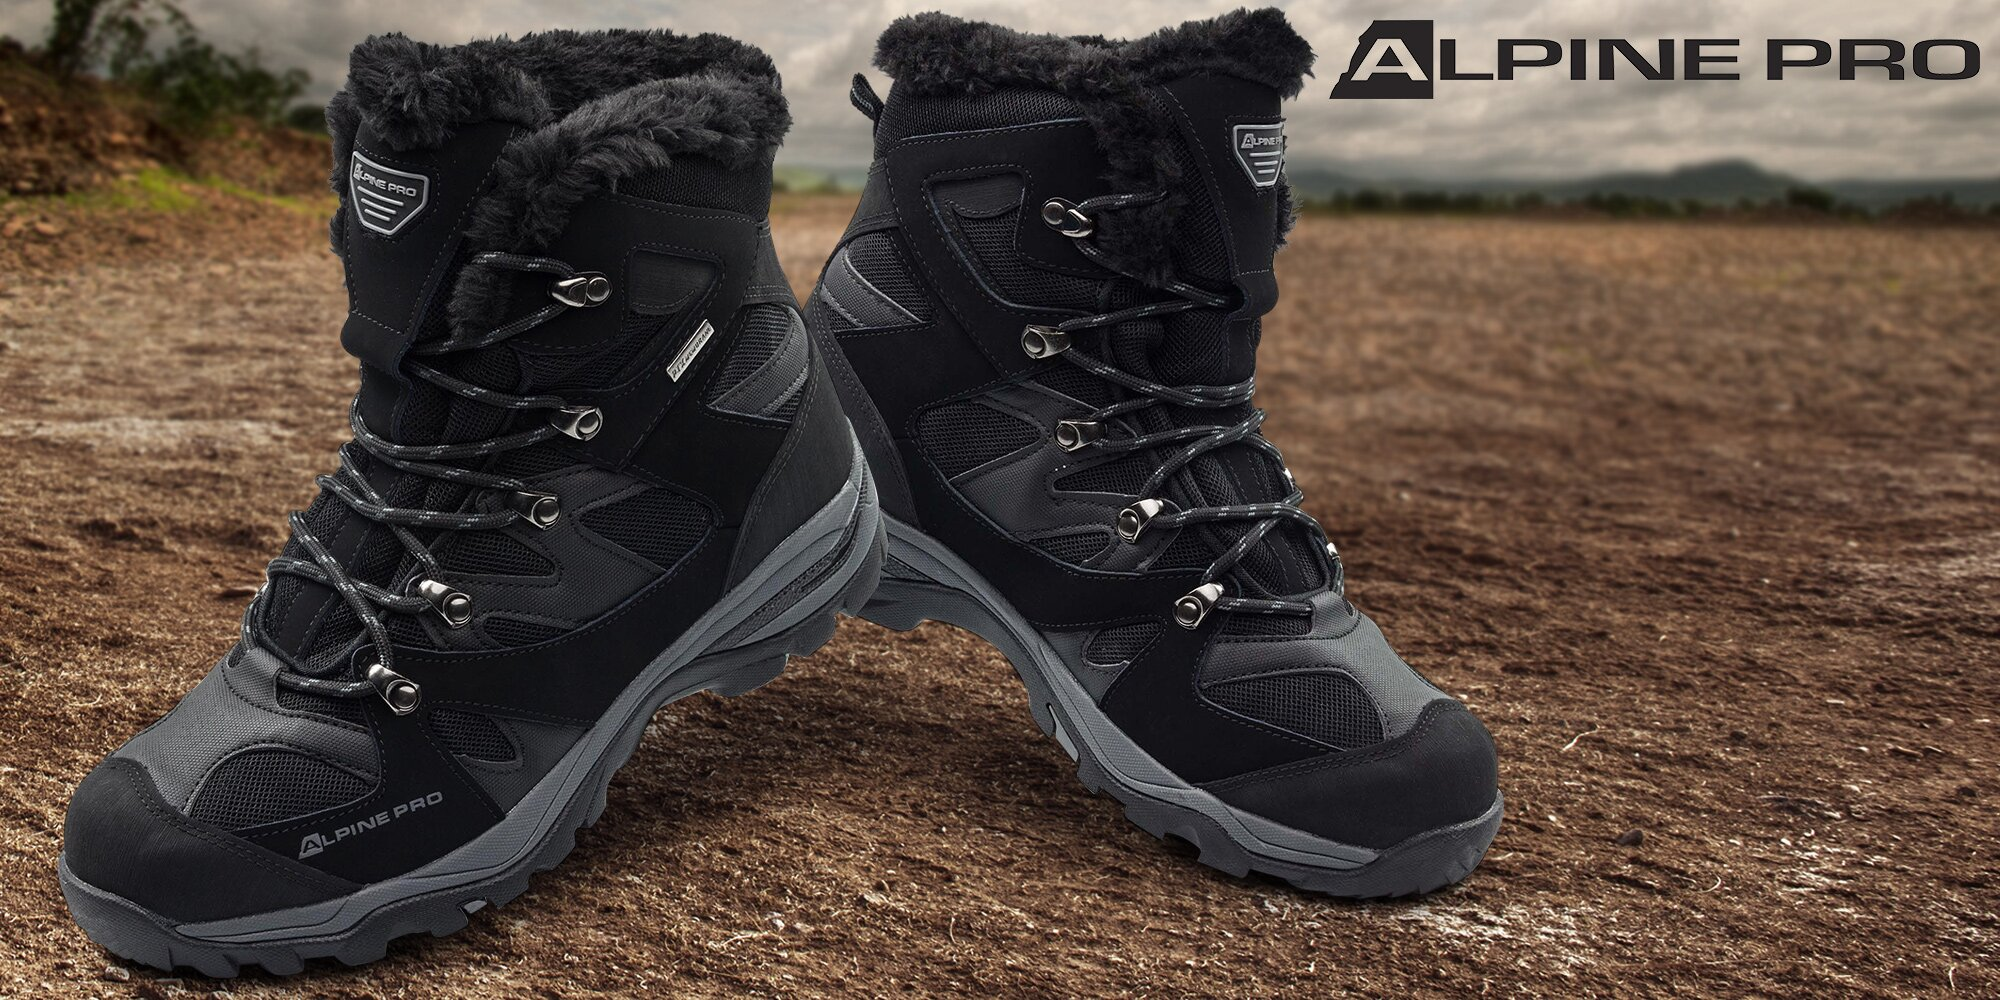 ce1d1f2e60 Aby nohy neprechladli  zateplená pánska zimná obuv Alpine Pro do terénu